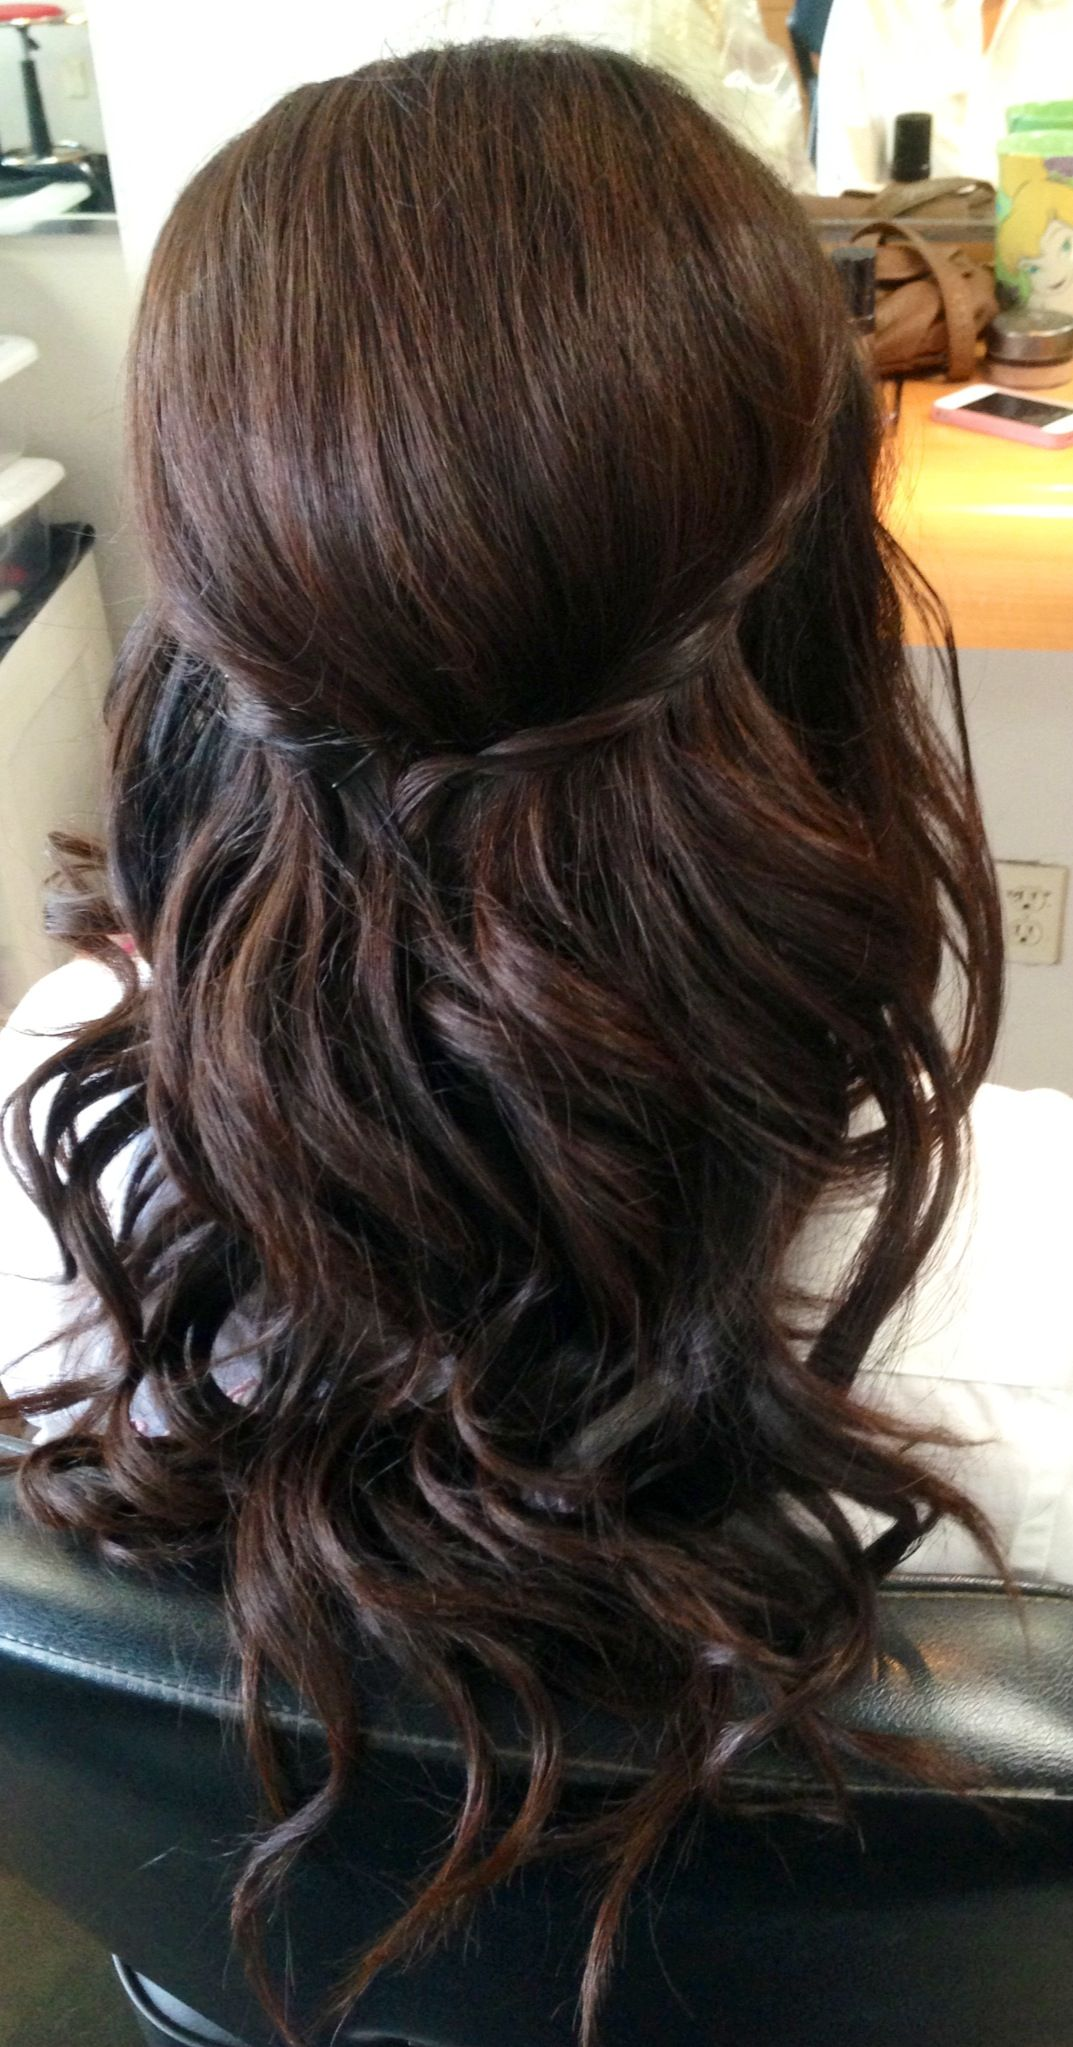 wedding updo, wedding hair, bridal hair, curls, half up half